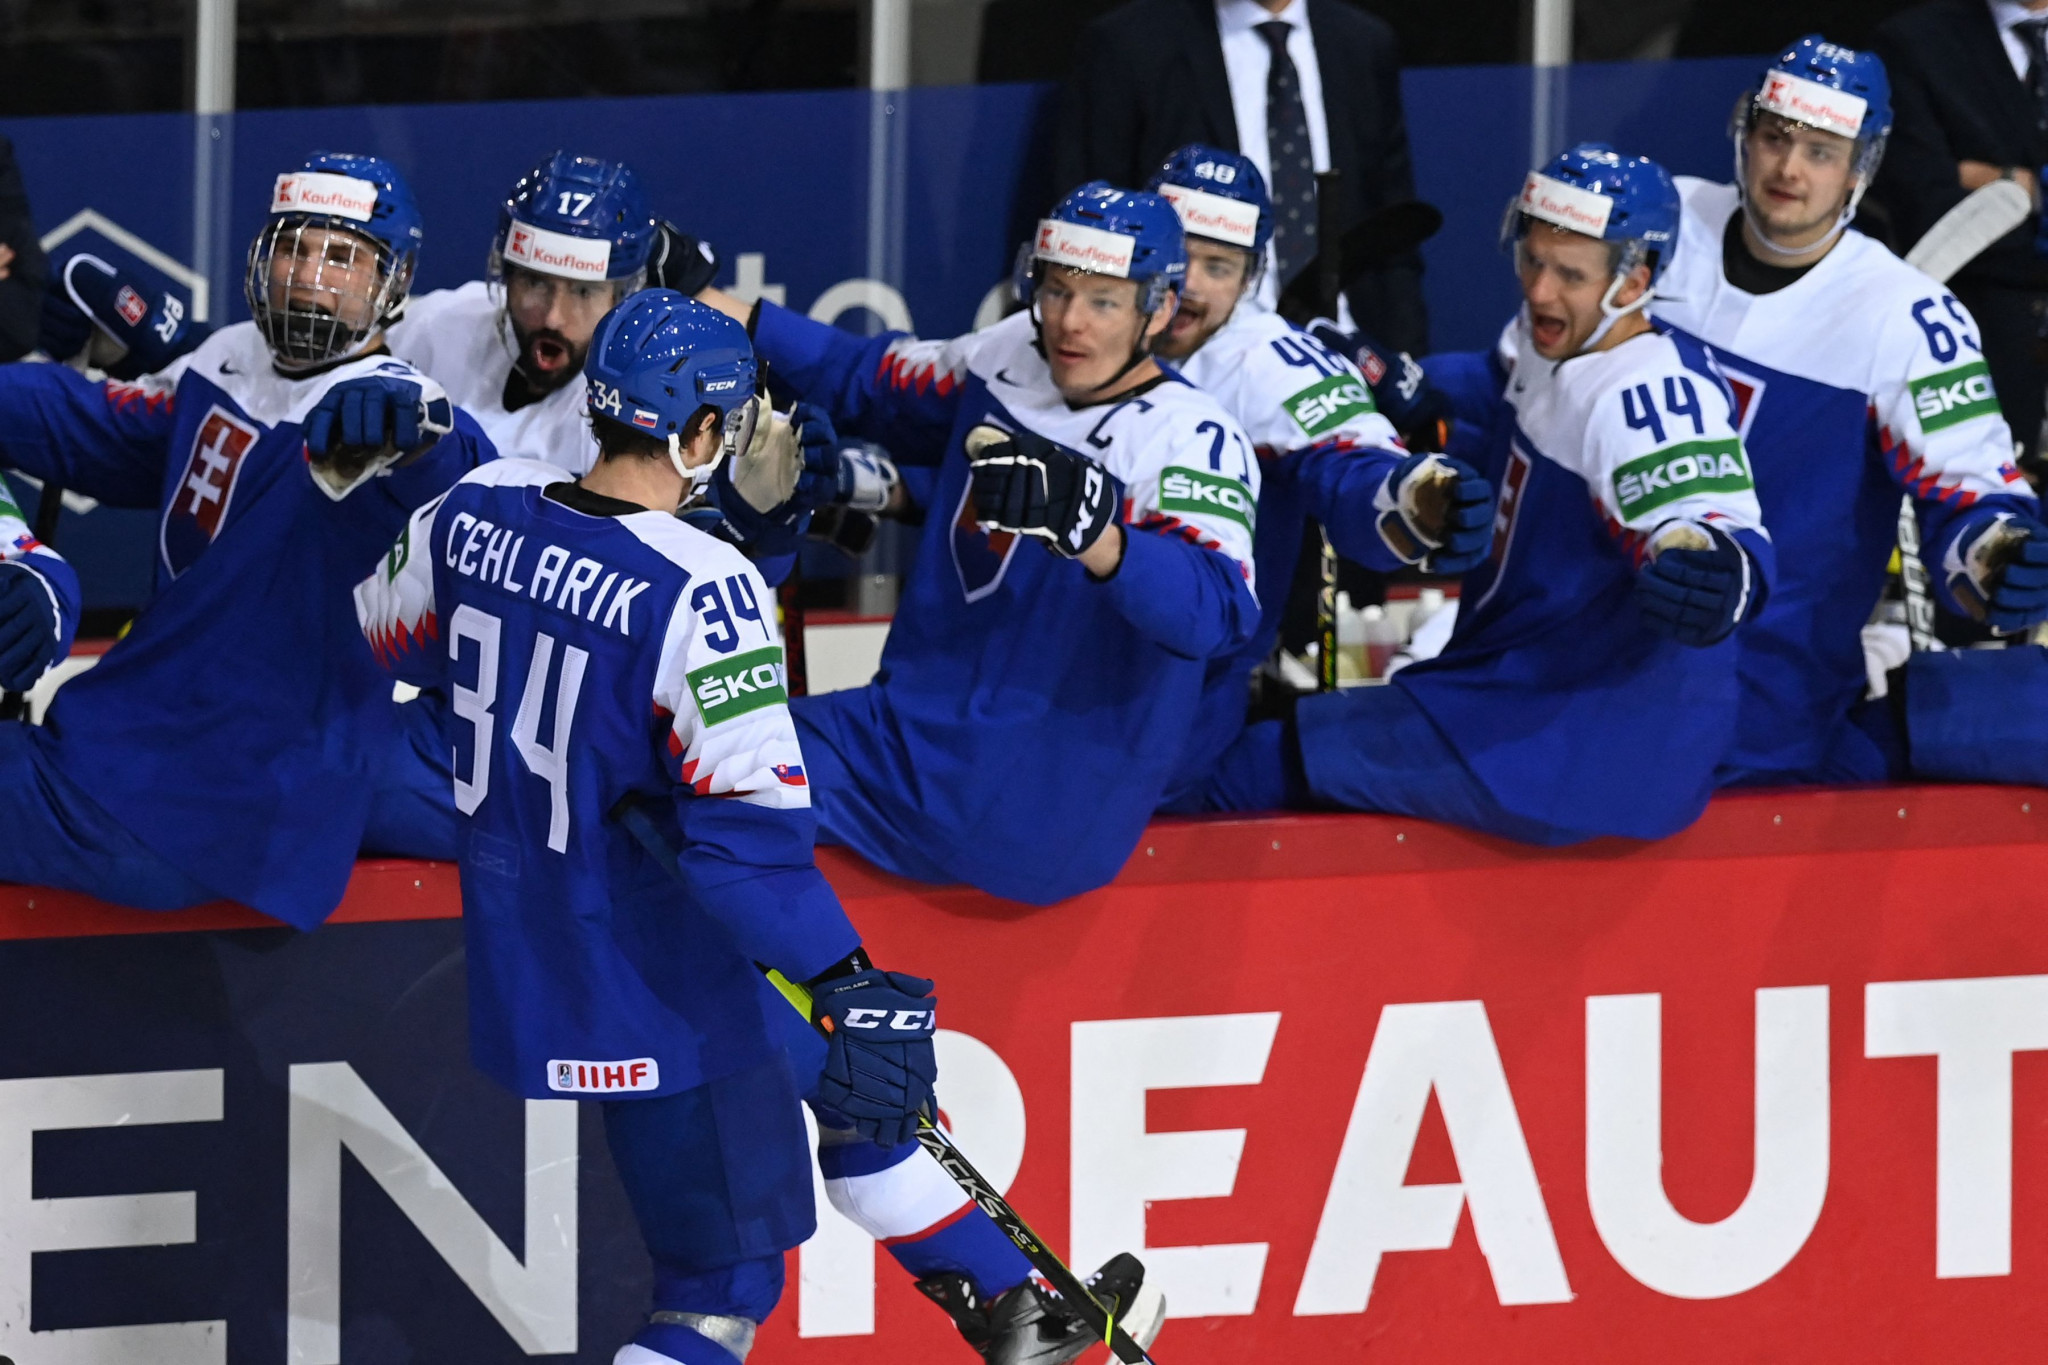 Slovakia seek Beijing 2022 spot as crunch time reached in men's ice hockey qualifiers